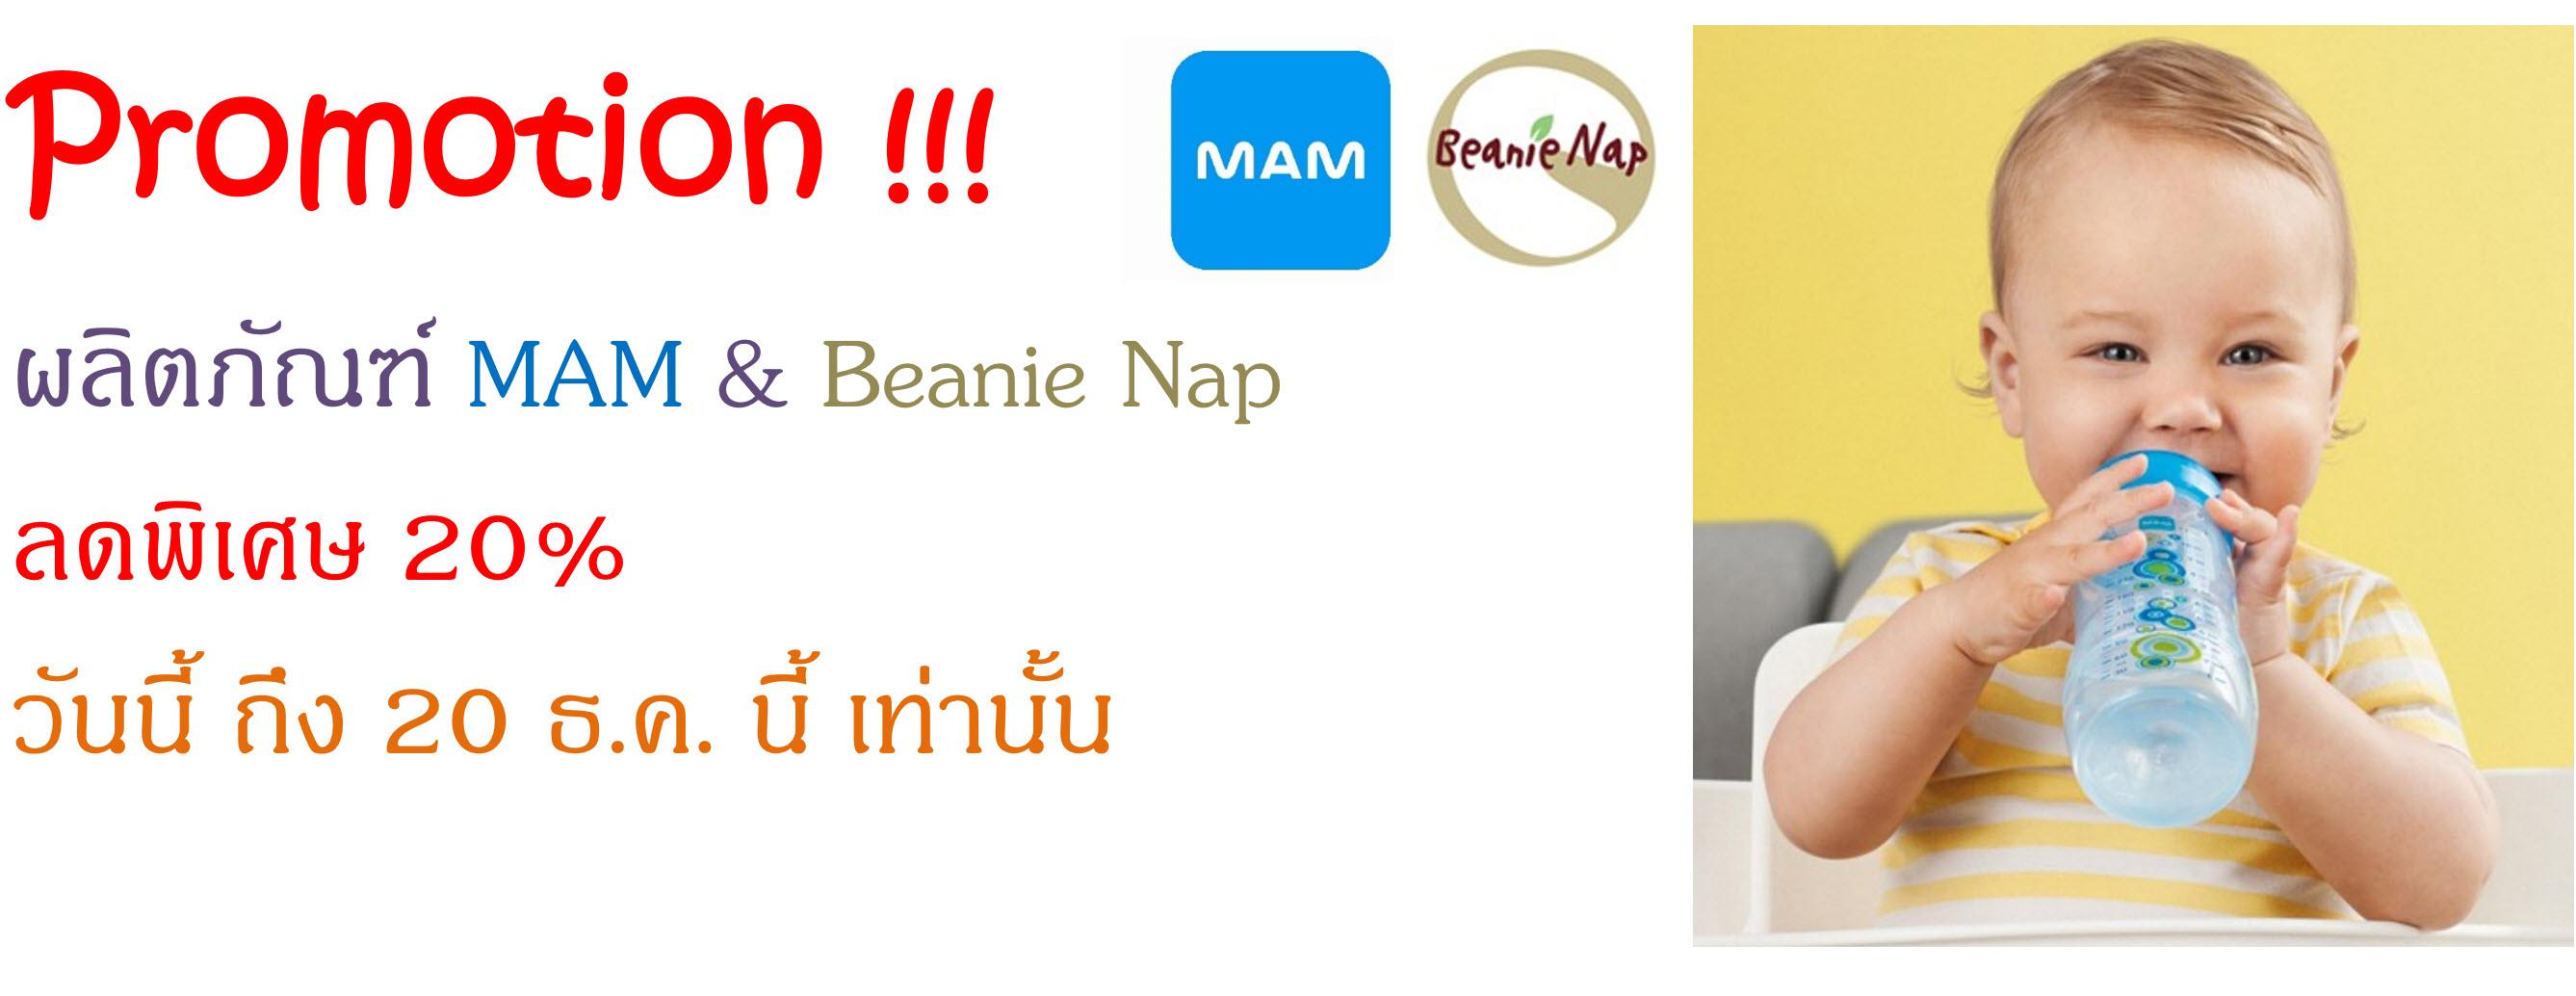 MAM & Beanie Nap promotion